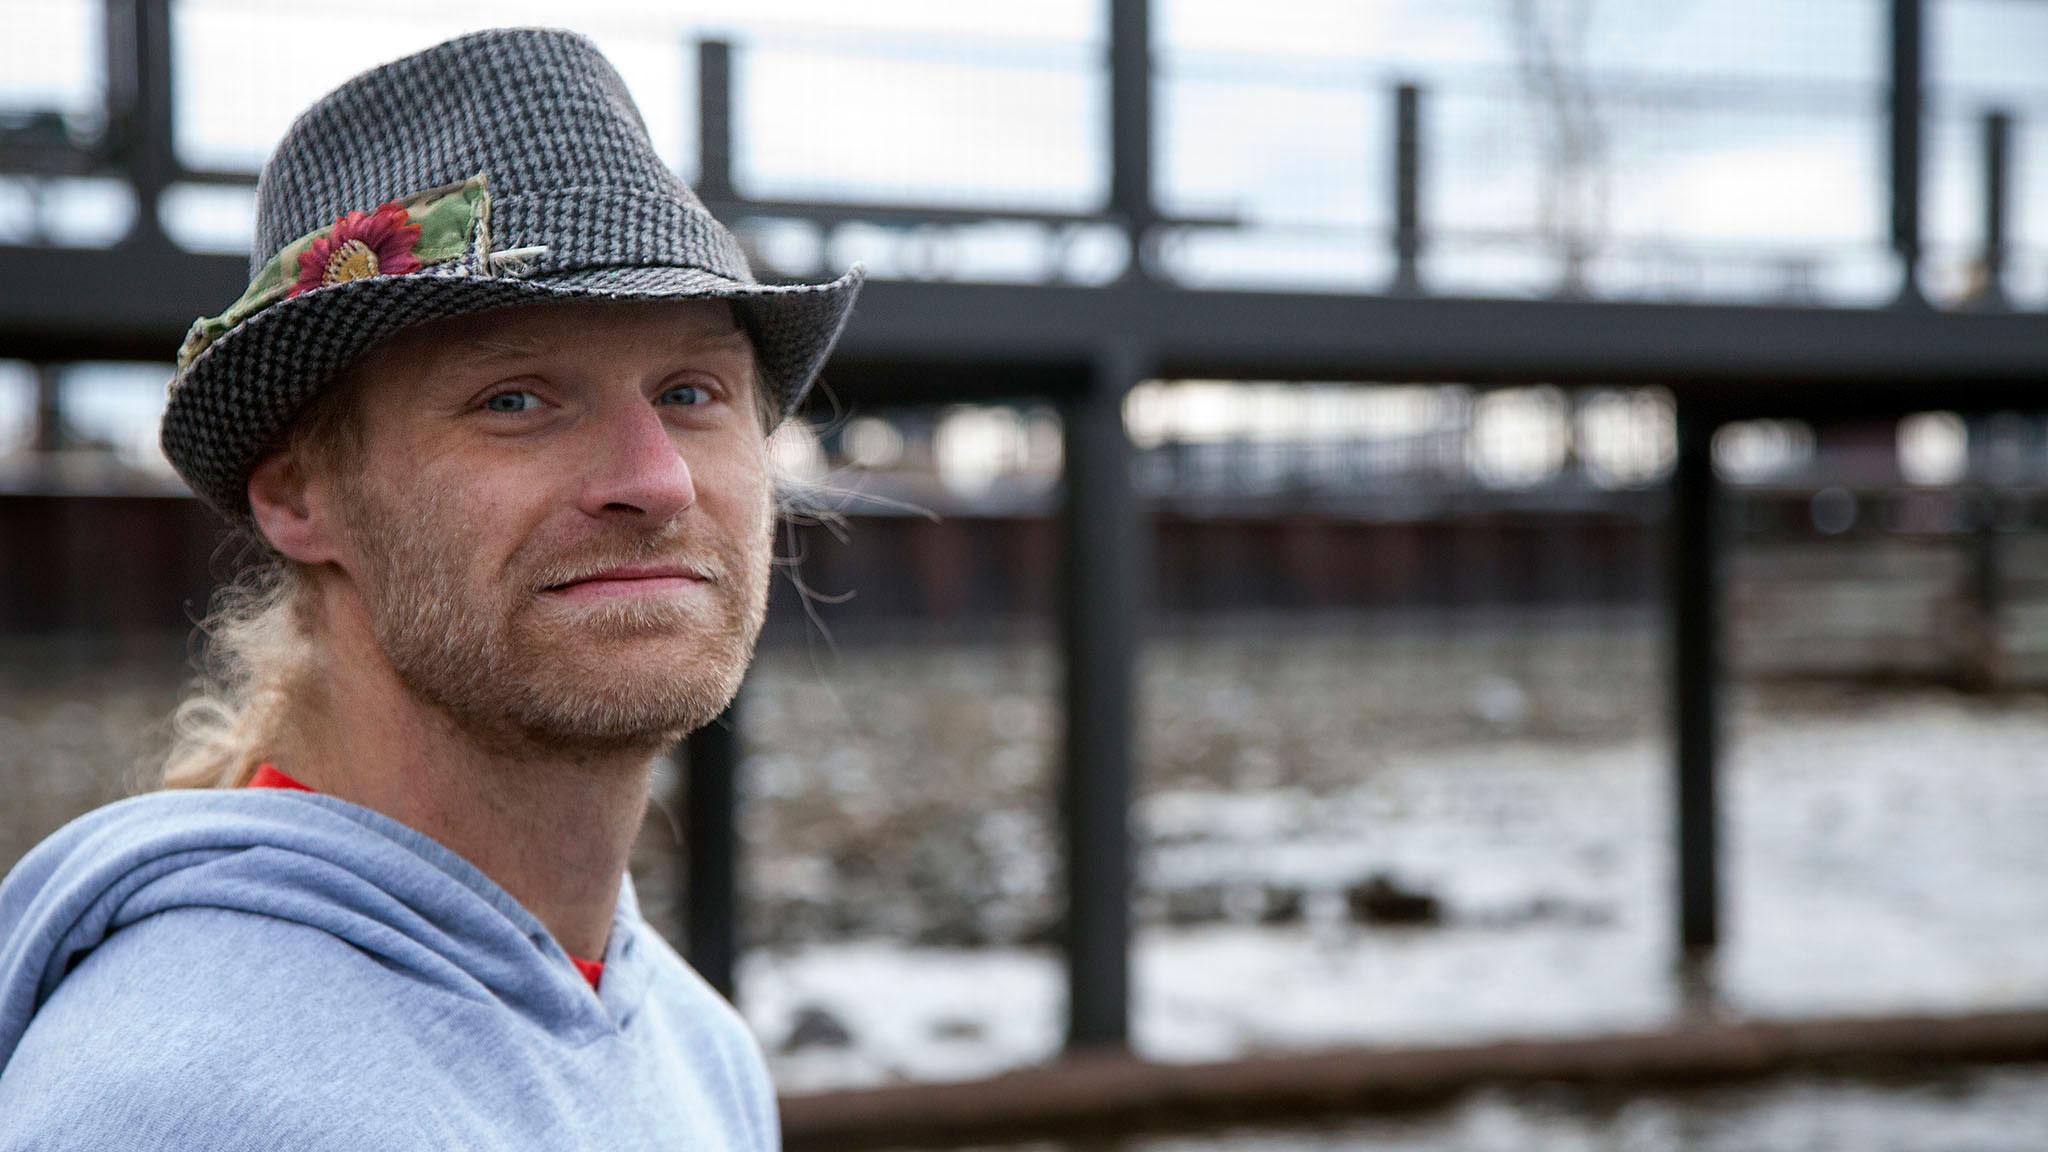 Kevin O'Meara wearing Kip Garre's fedora hat on the shores of Lake Tahoe.